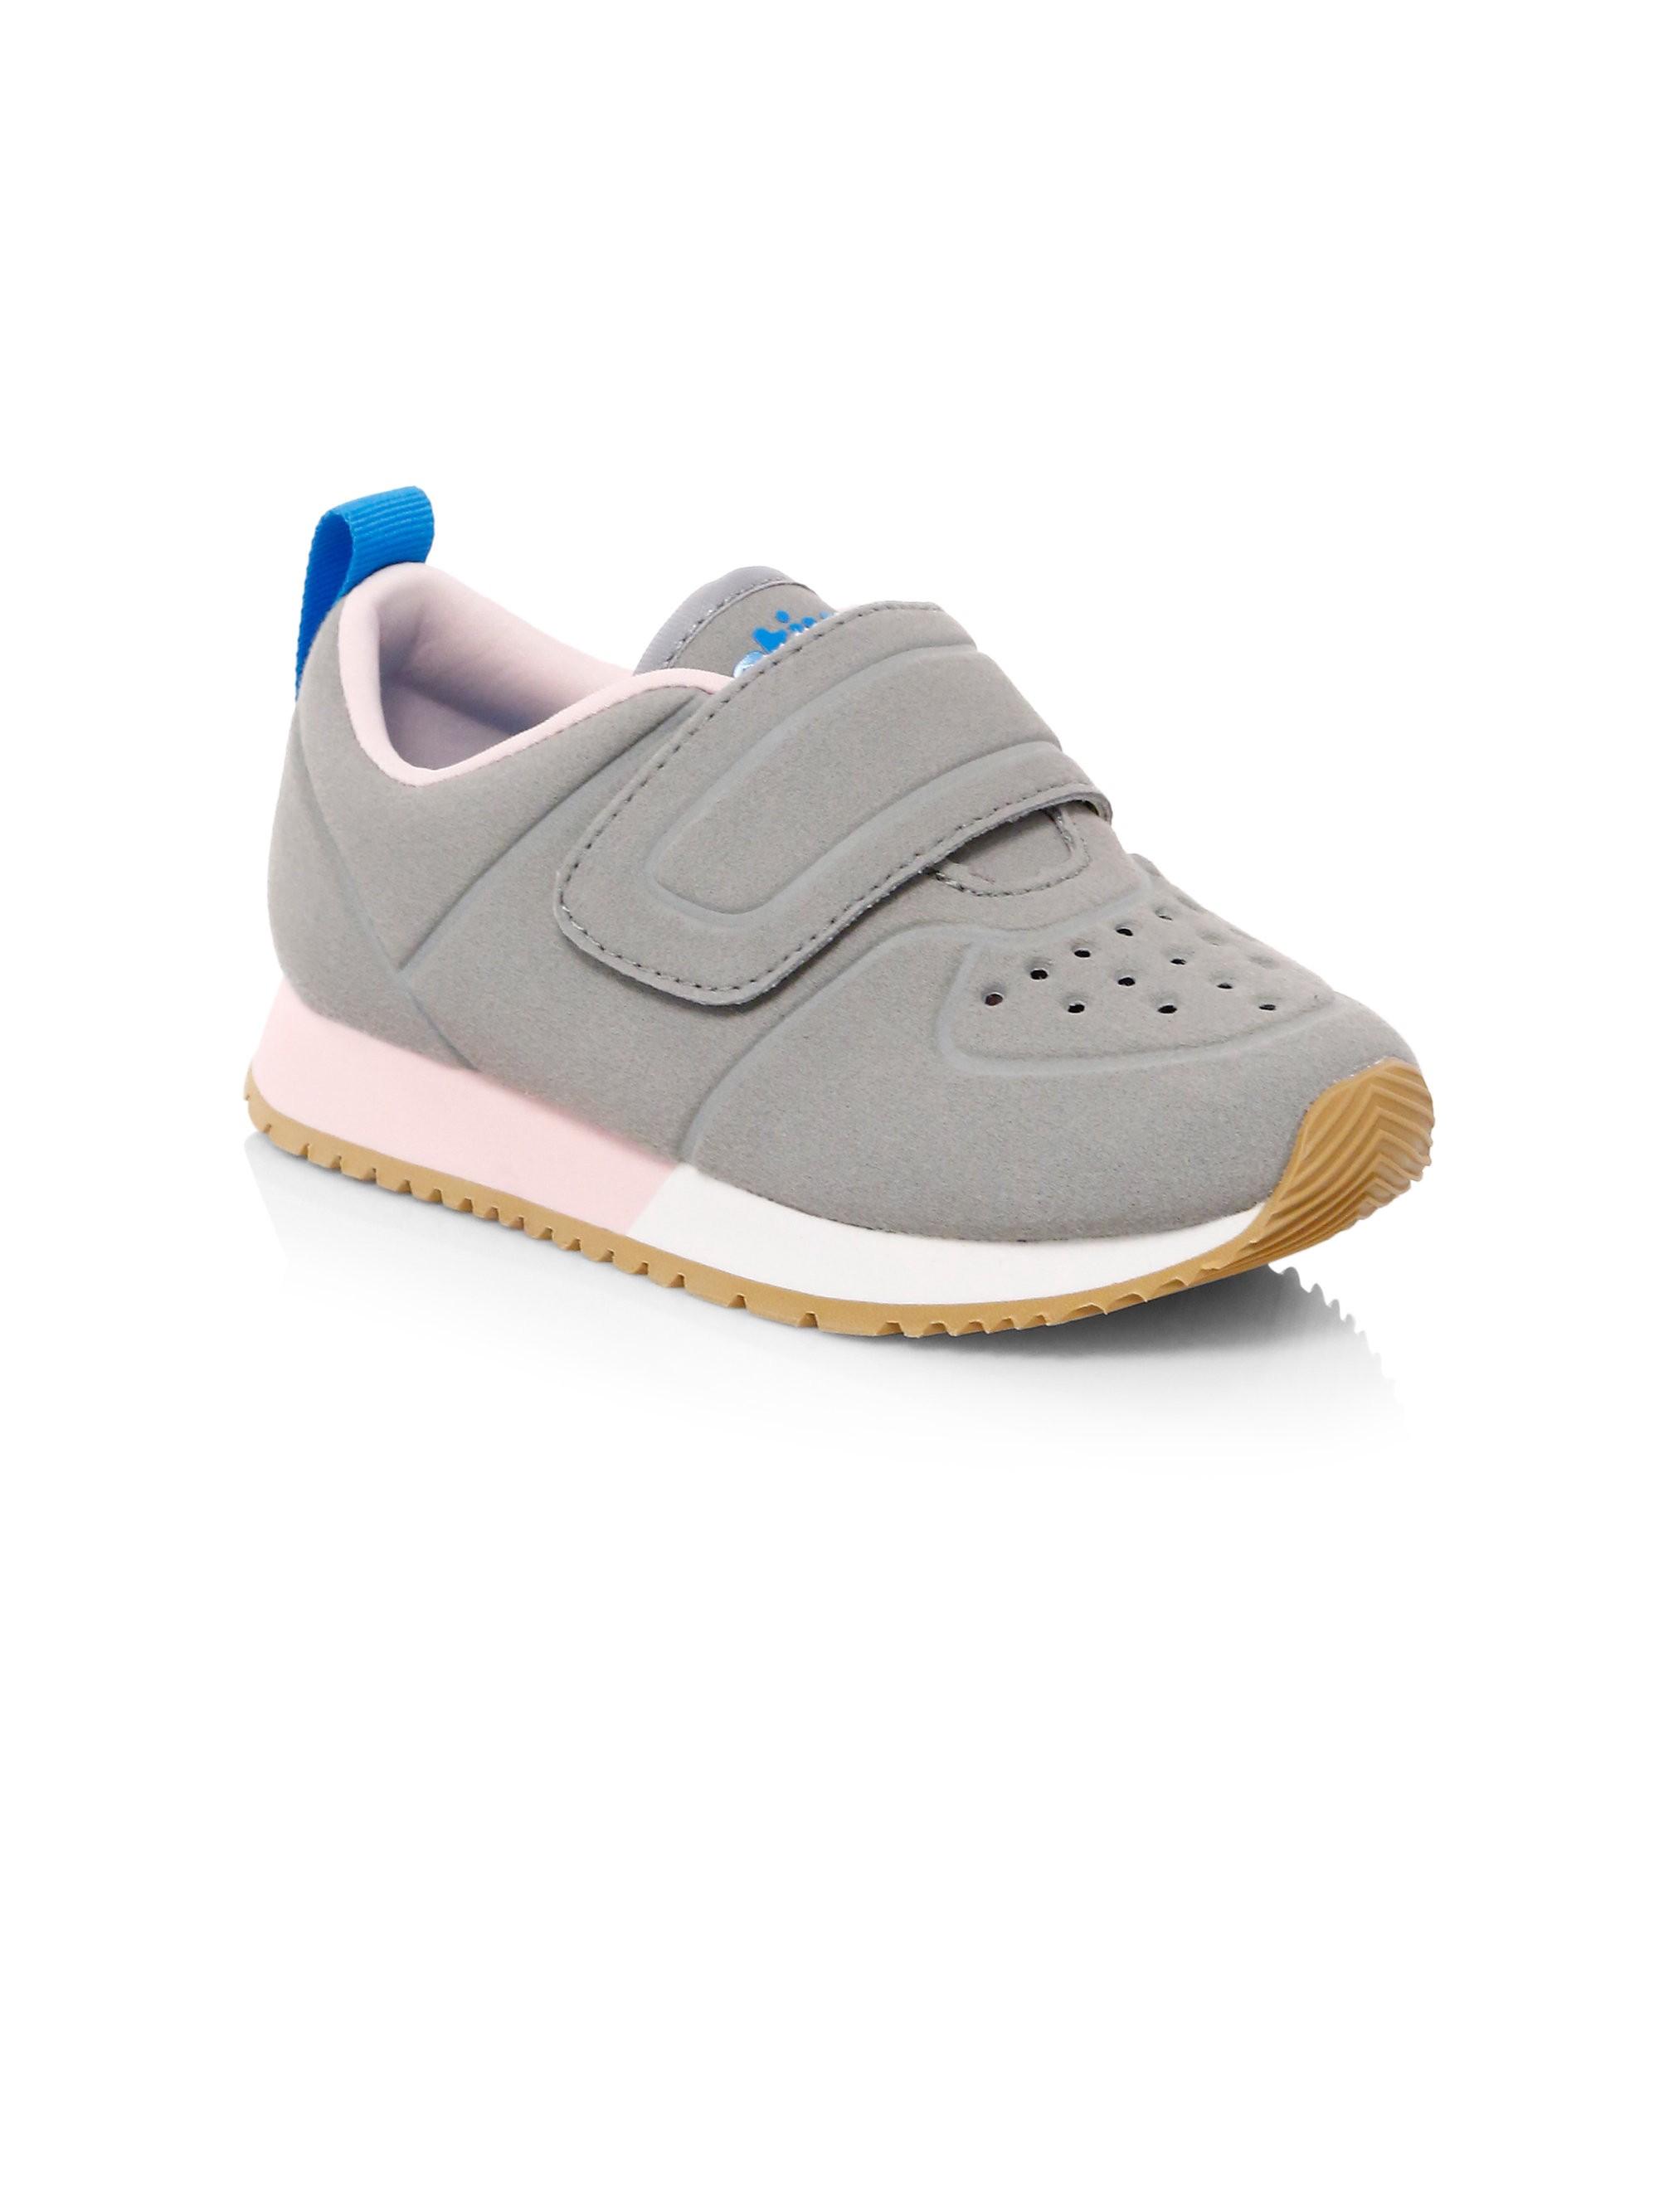 Native Shoes Kids Toddler's \u0026 Kid's